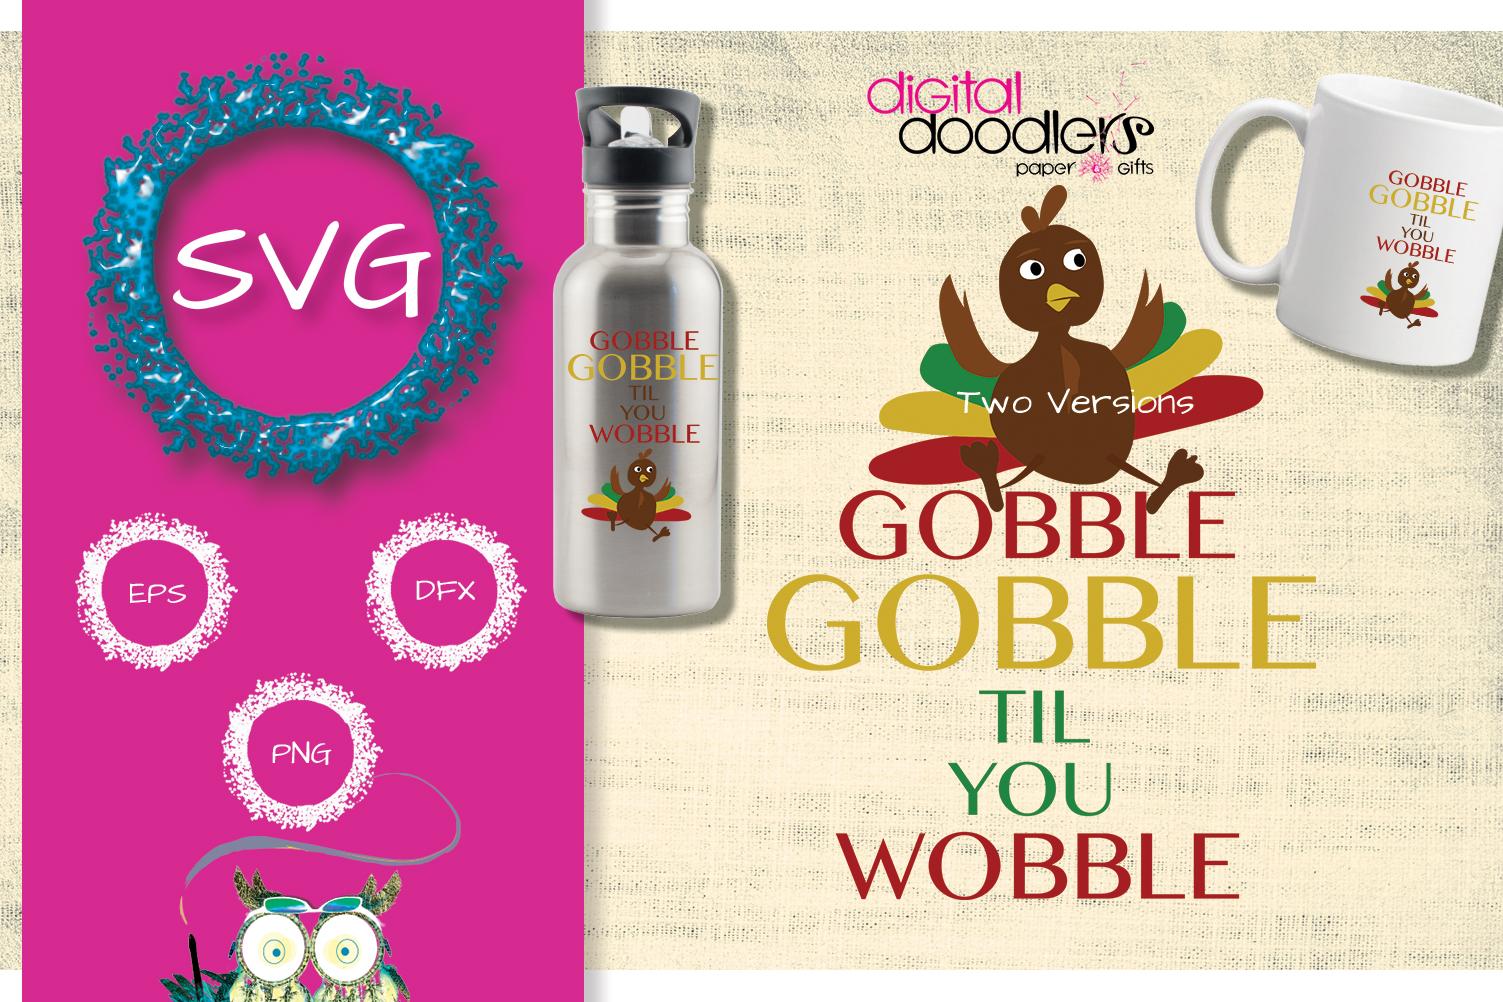 Gobble Gobble Til You Wobble example image 1